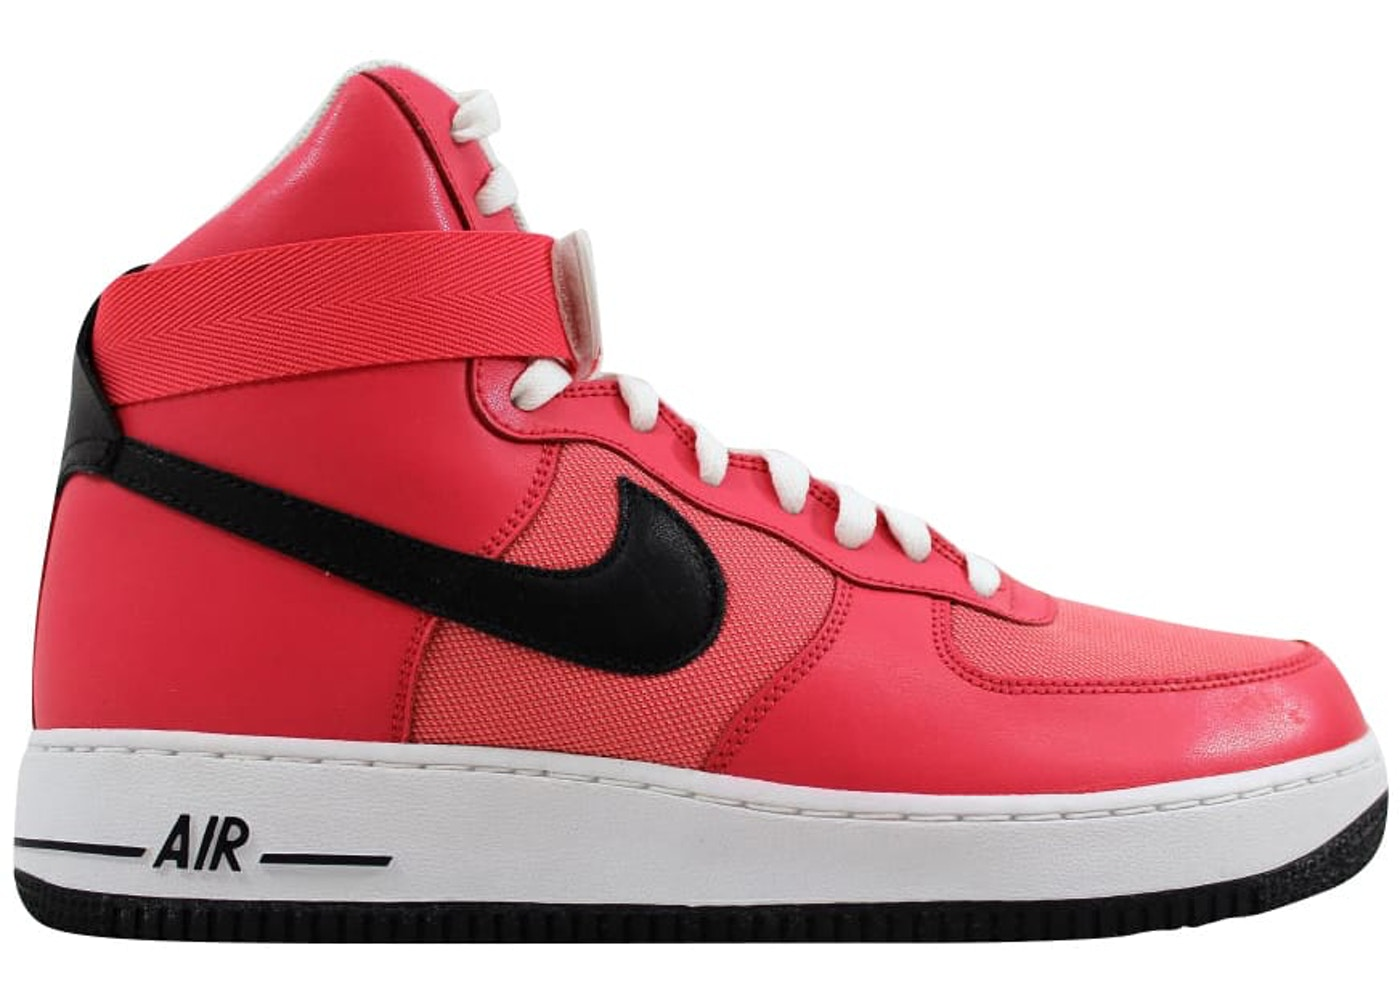 Nike Air Force 1 High Solar Red Black White W 334031 601